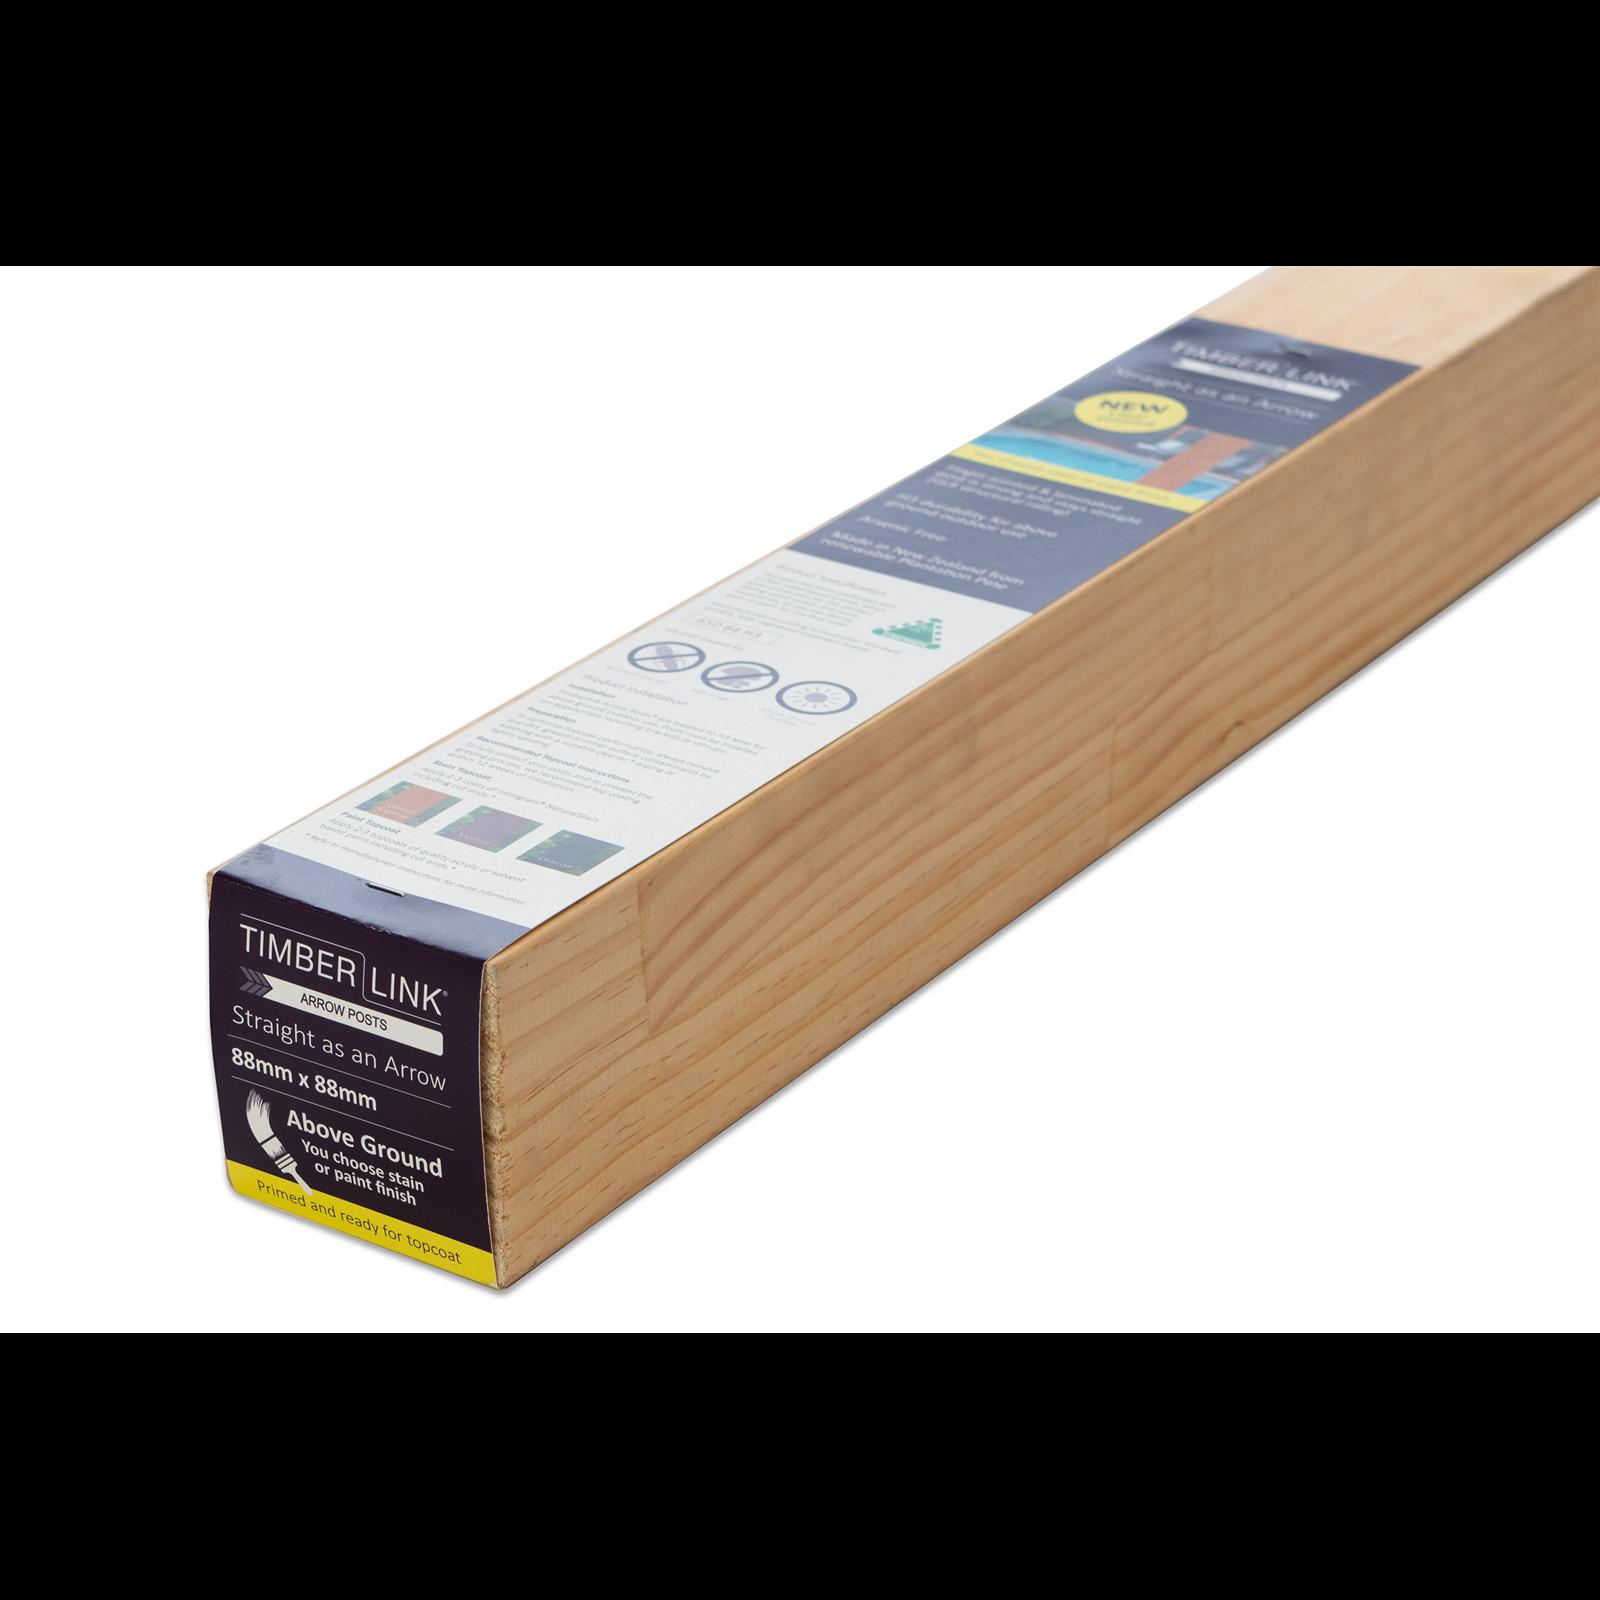 88 x 88mm 2.7m H3 KD Clear Primed FJ Laminated LOSP Pine Post